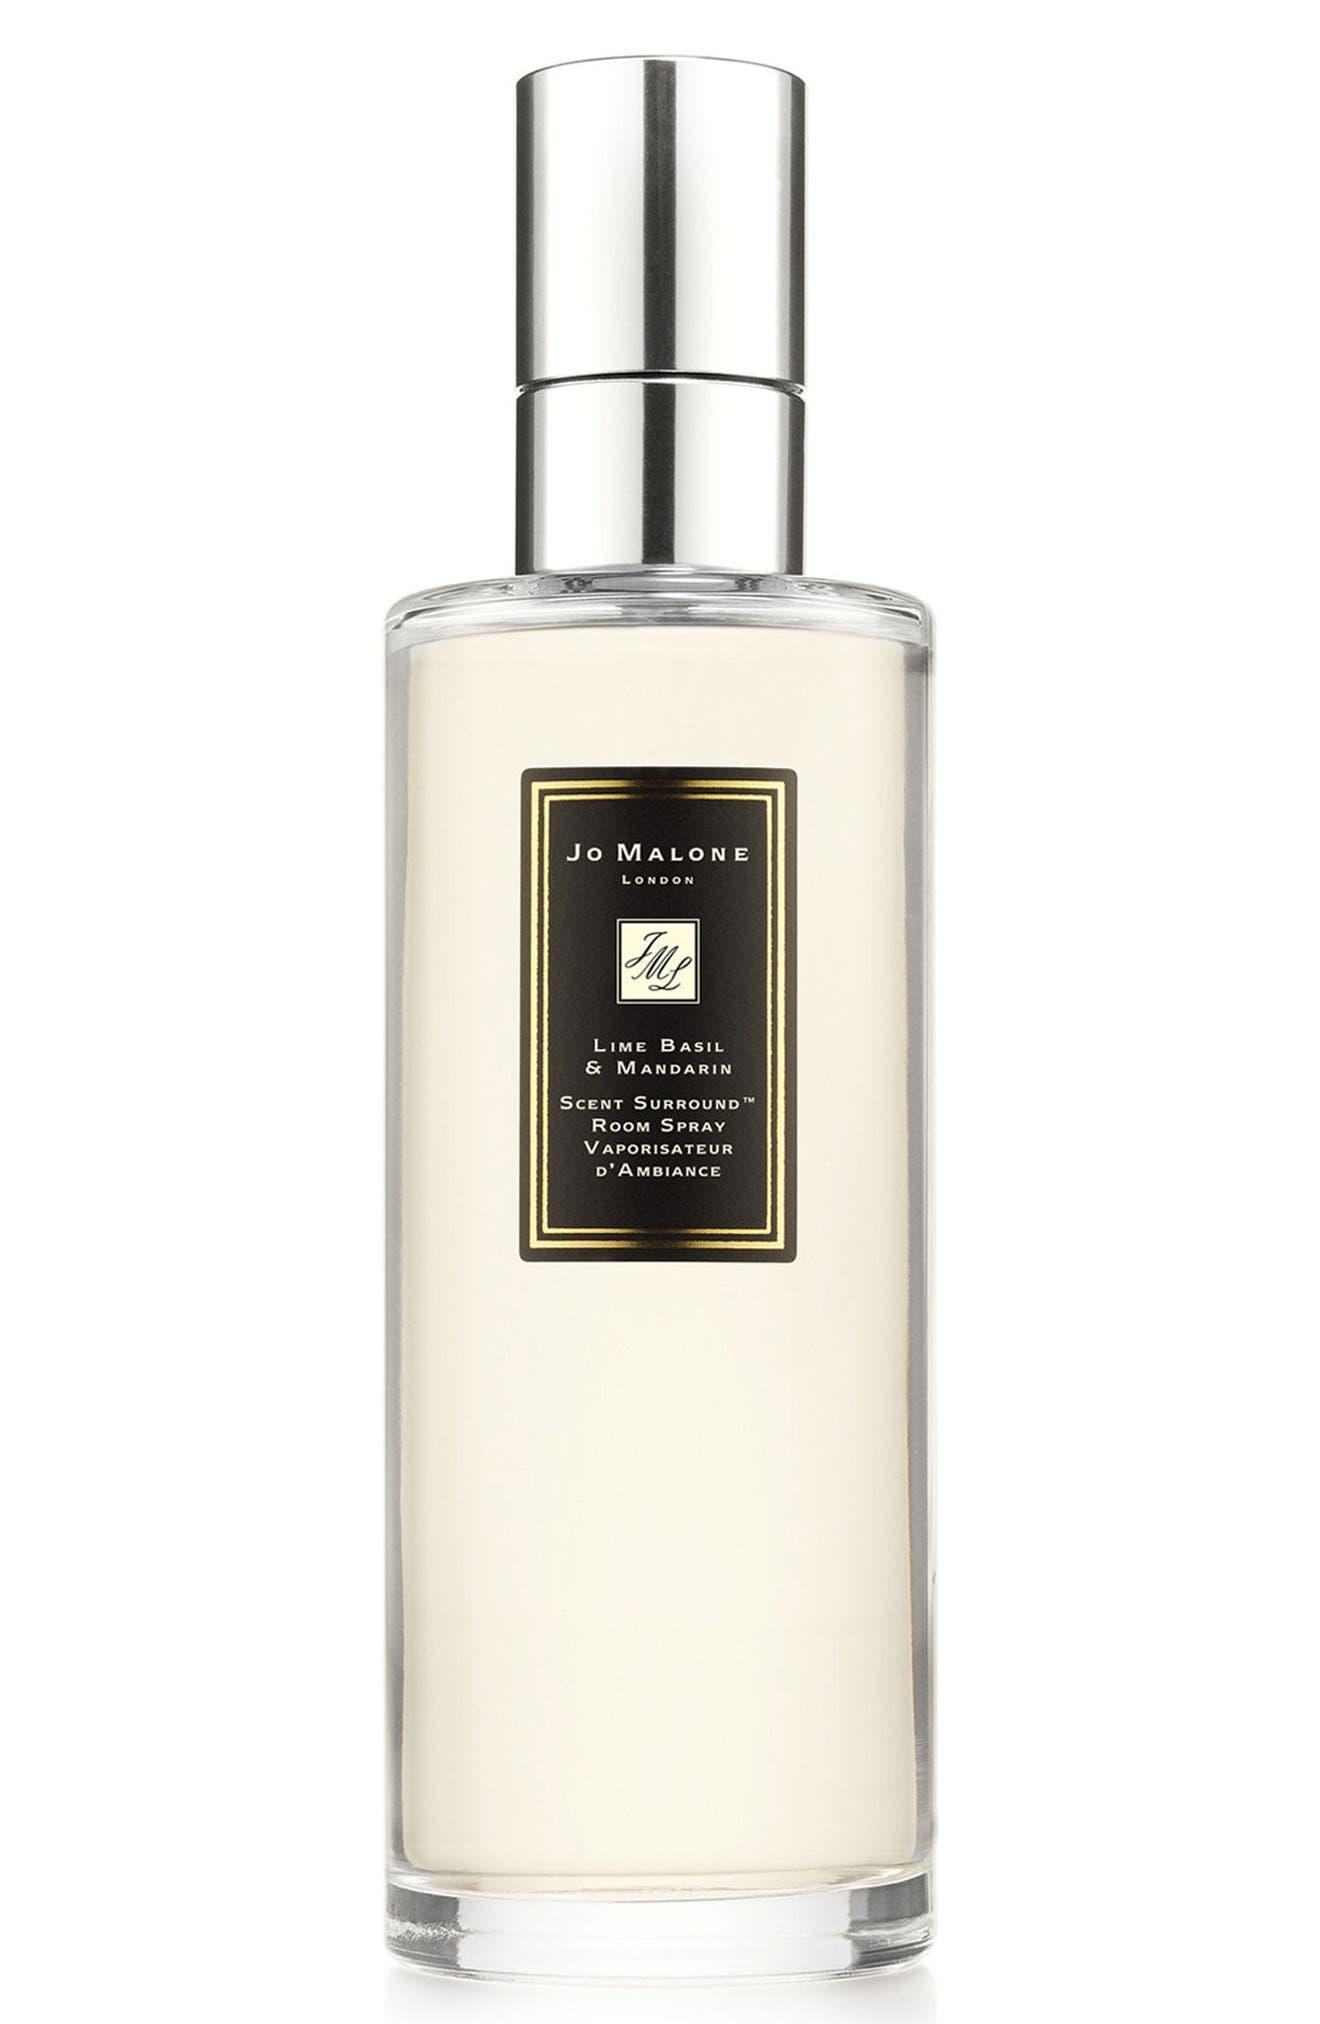 Jo Malone™ Lime Basil & Mandarin Scent Surround™ Room Spray